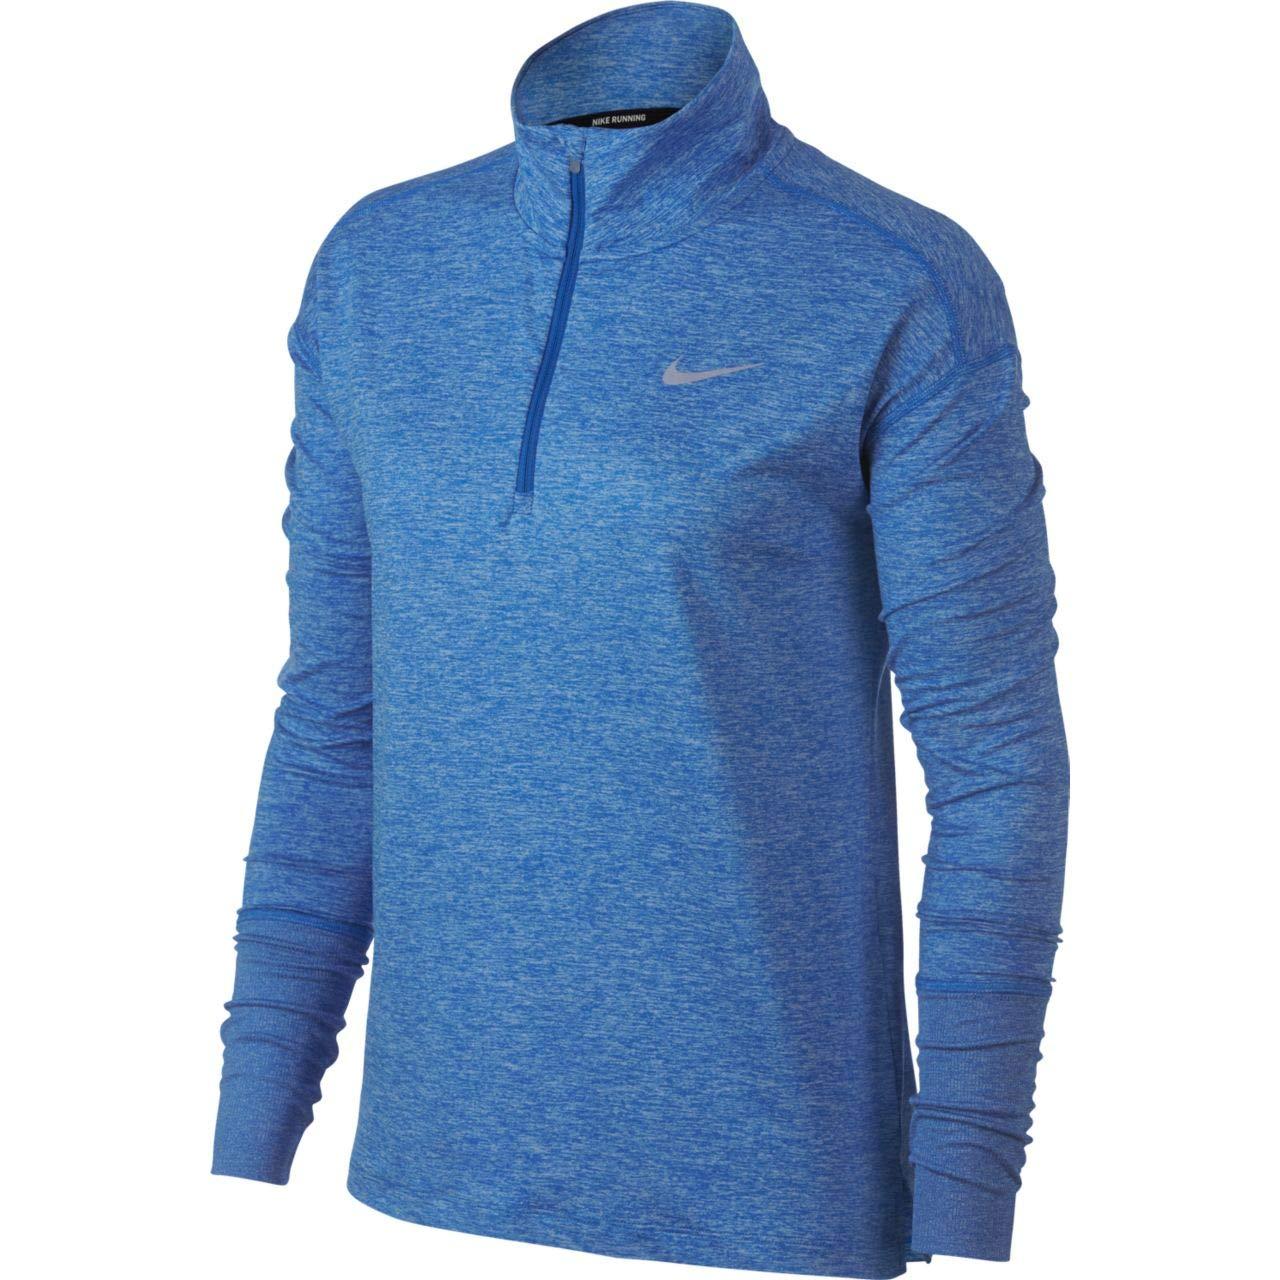 Nike Women's Element 1/2 Zip Top Signal Blue/Cobalt Tint/Heather Medium by Nike